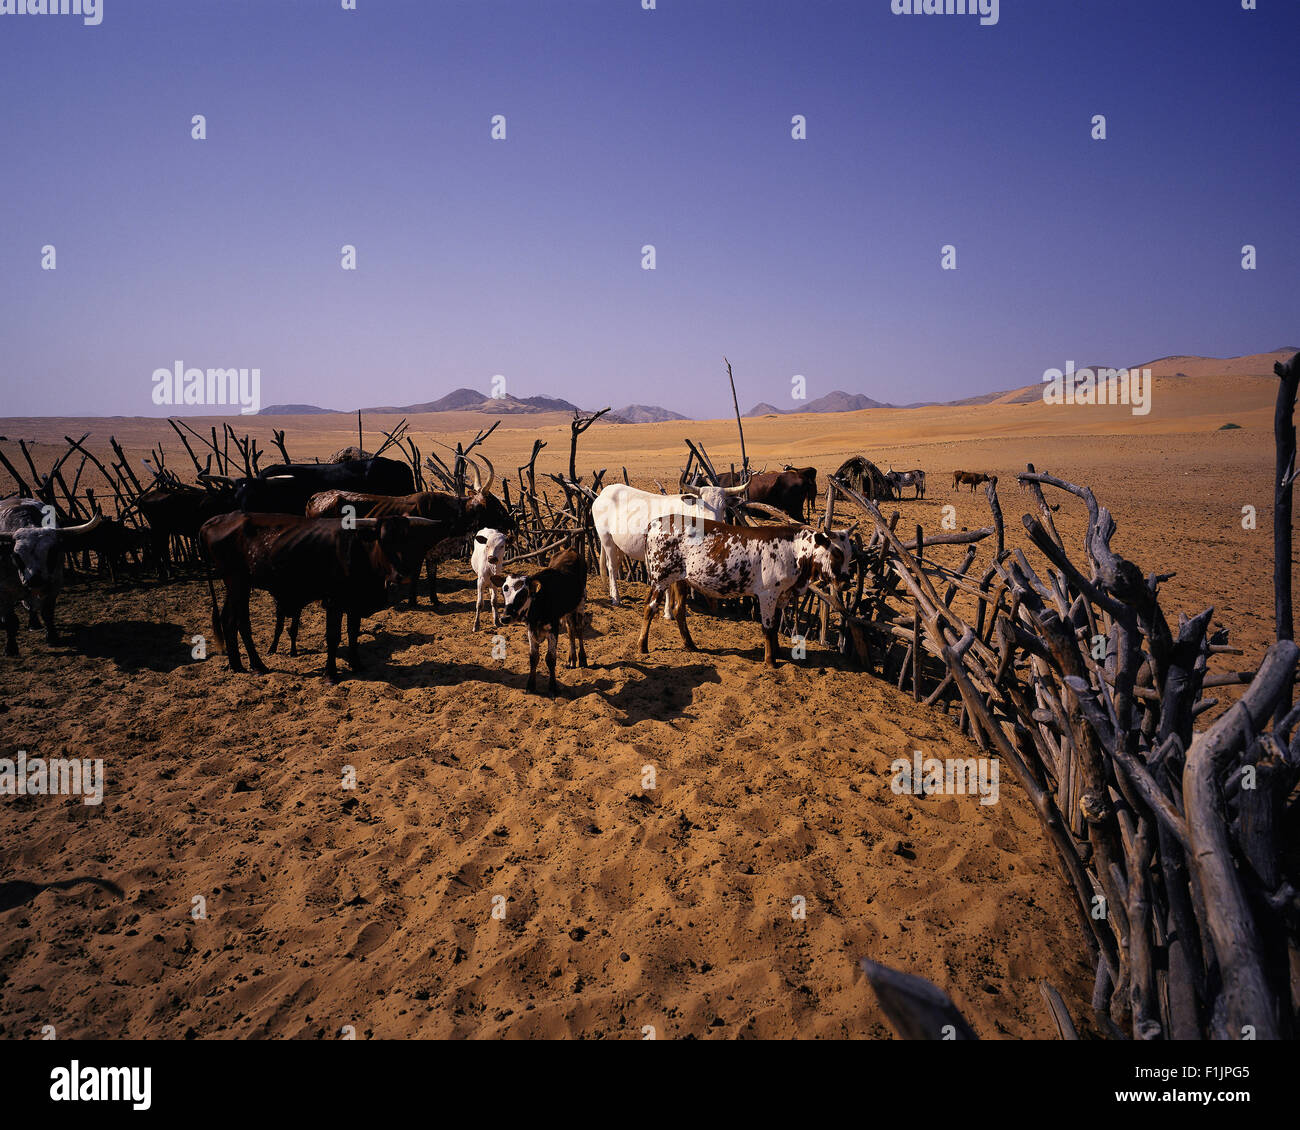 Cattle Kraal in Kunene River Region, Namibia, Africa Stock Photo